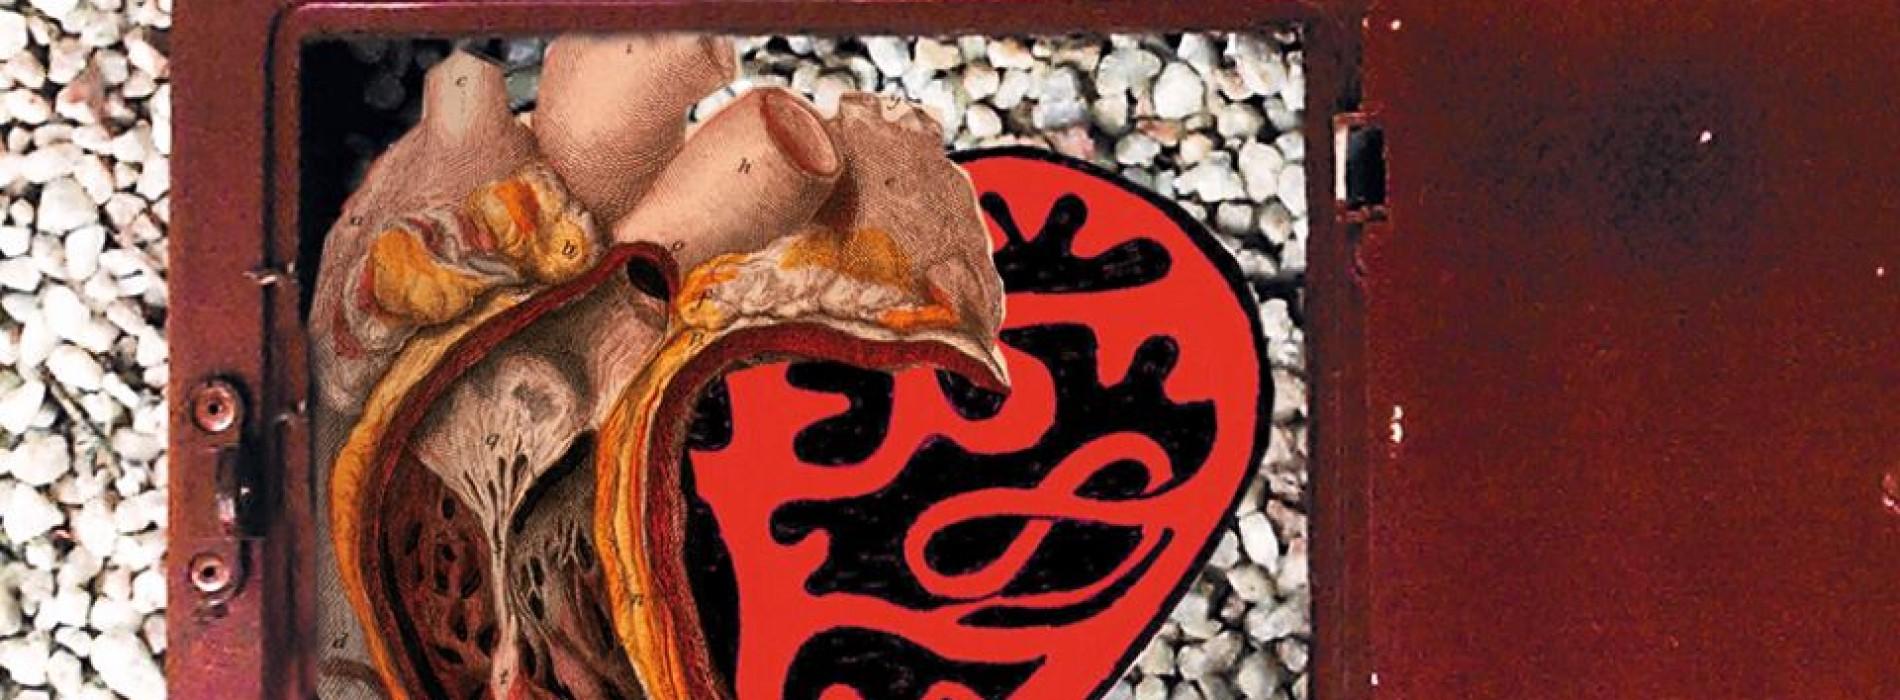 Imaad majeed – Letterbox Heart